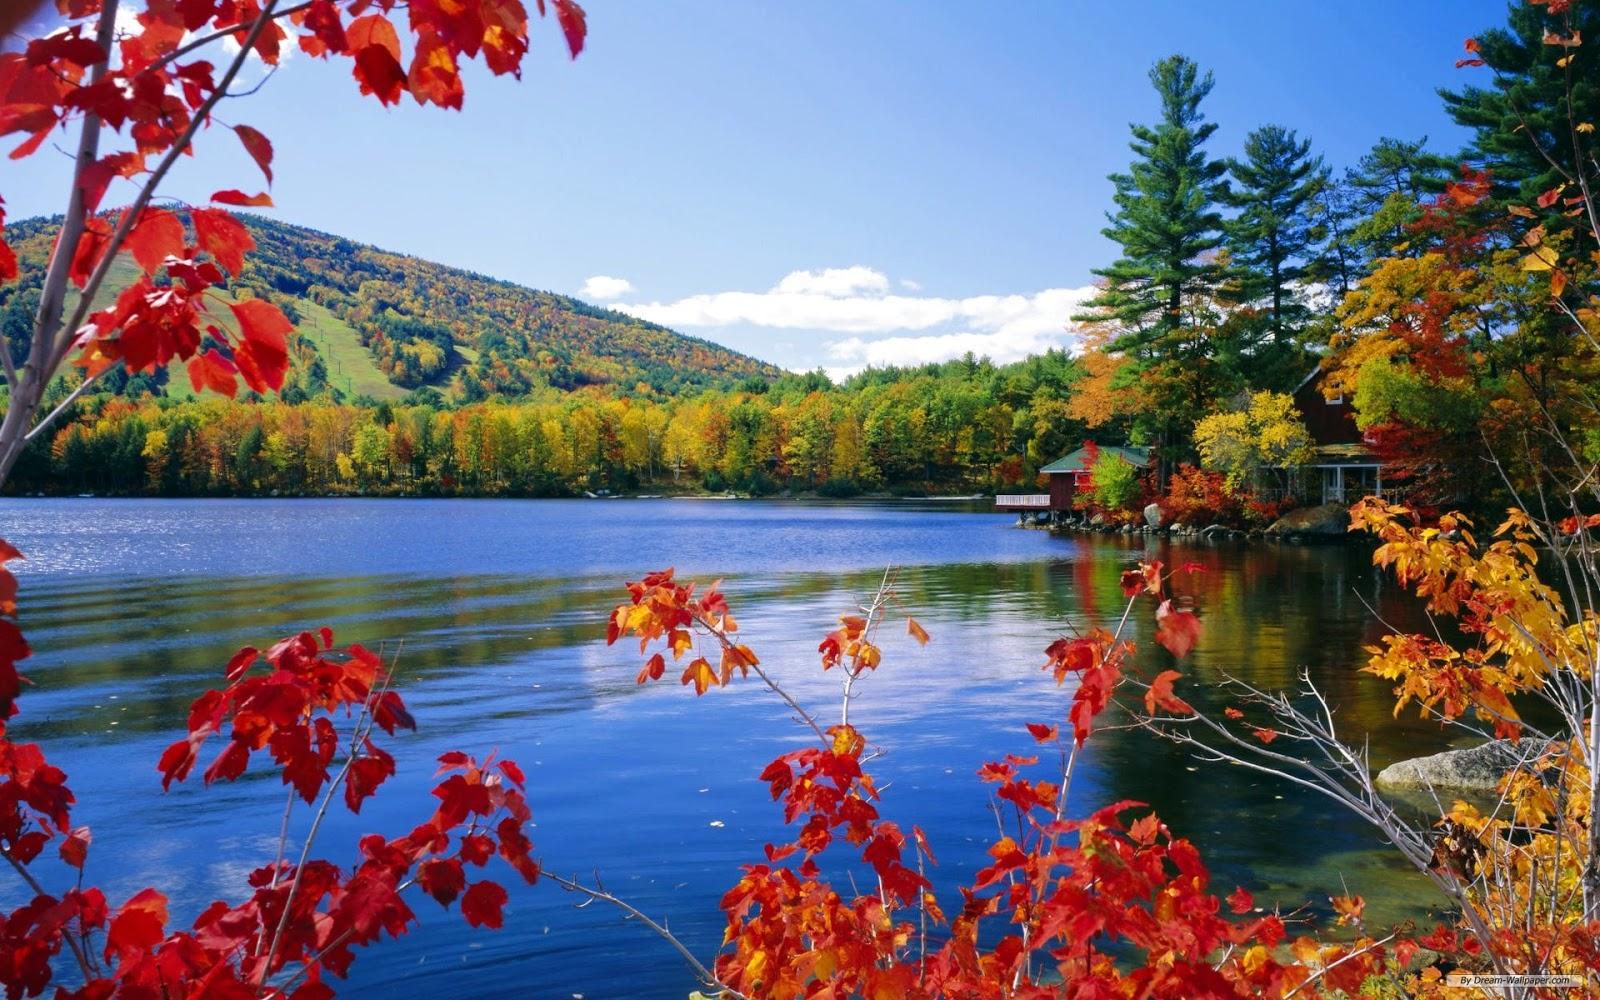 Hd Background Wallpaper Free Download Beautiful Nature Hd